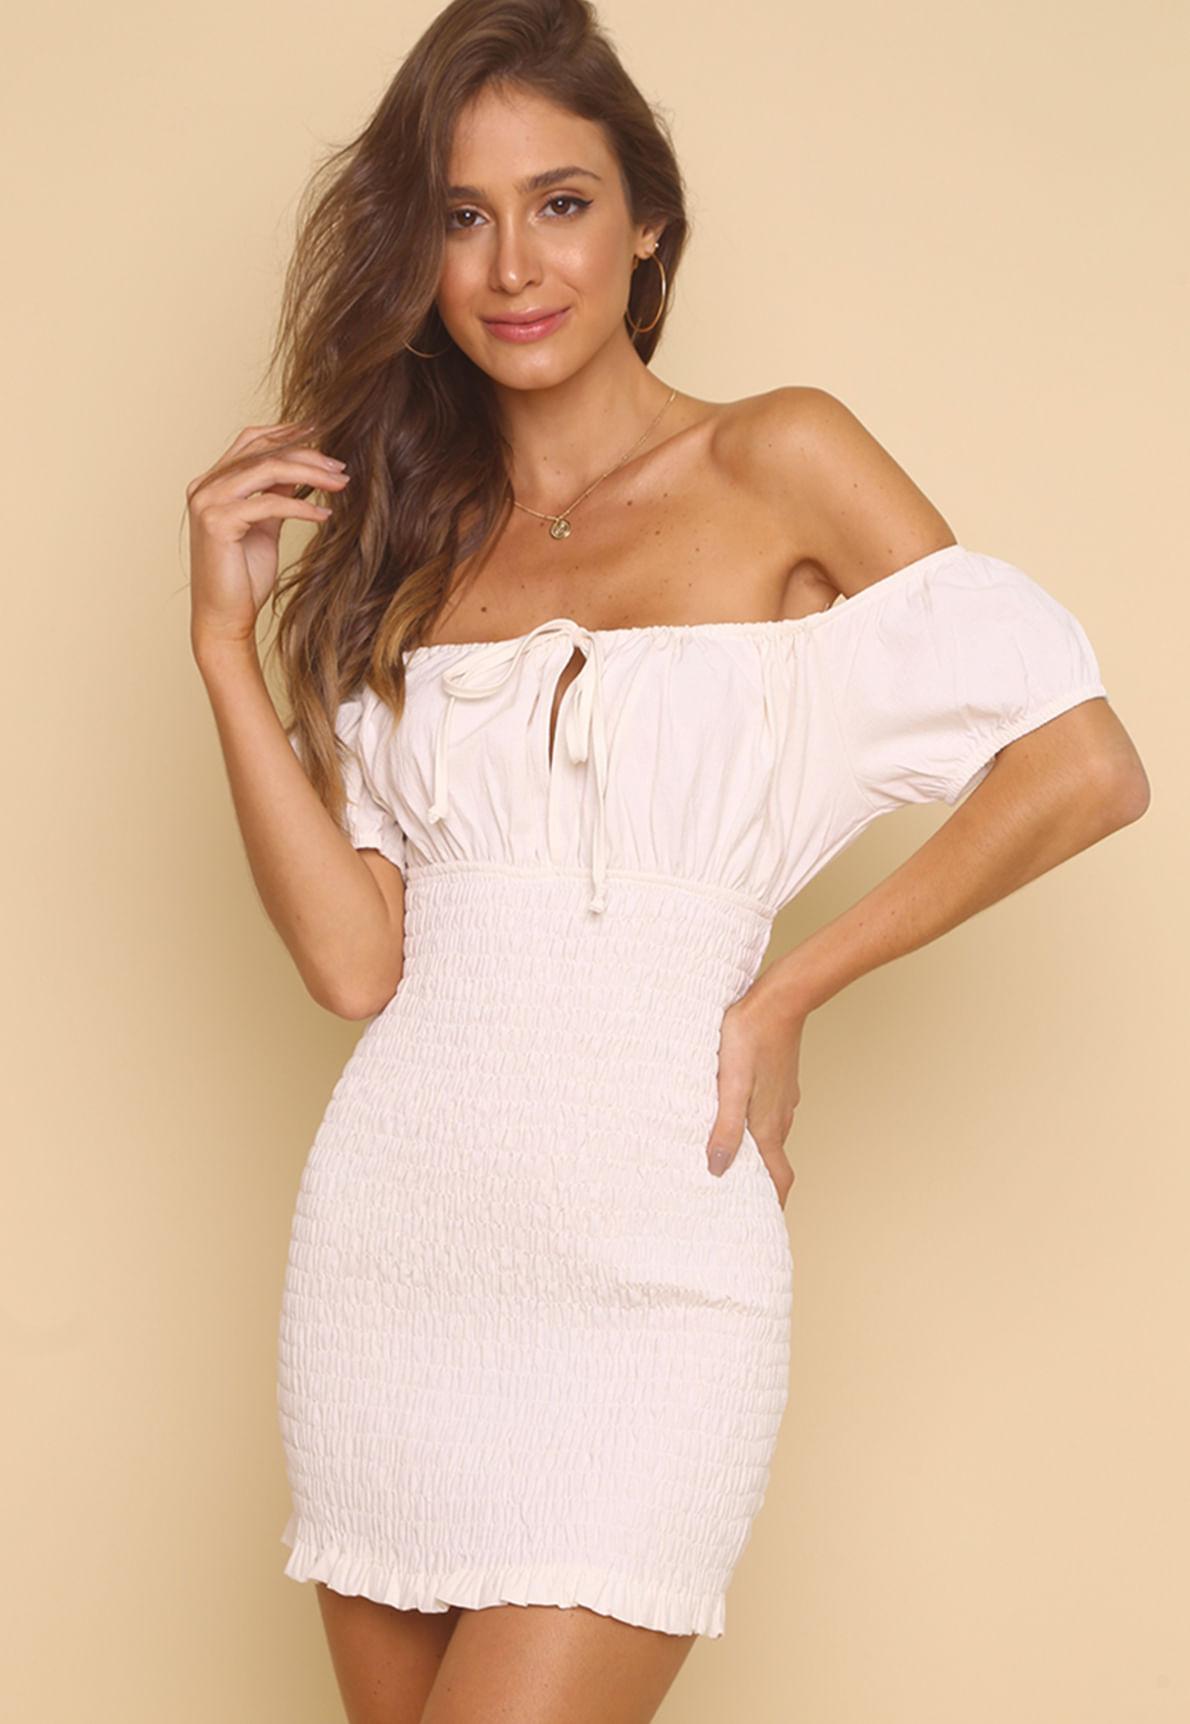 29837-vestido-ombro-a-ombro-lastex-mel-off-white-01.jpg